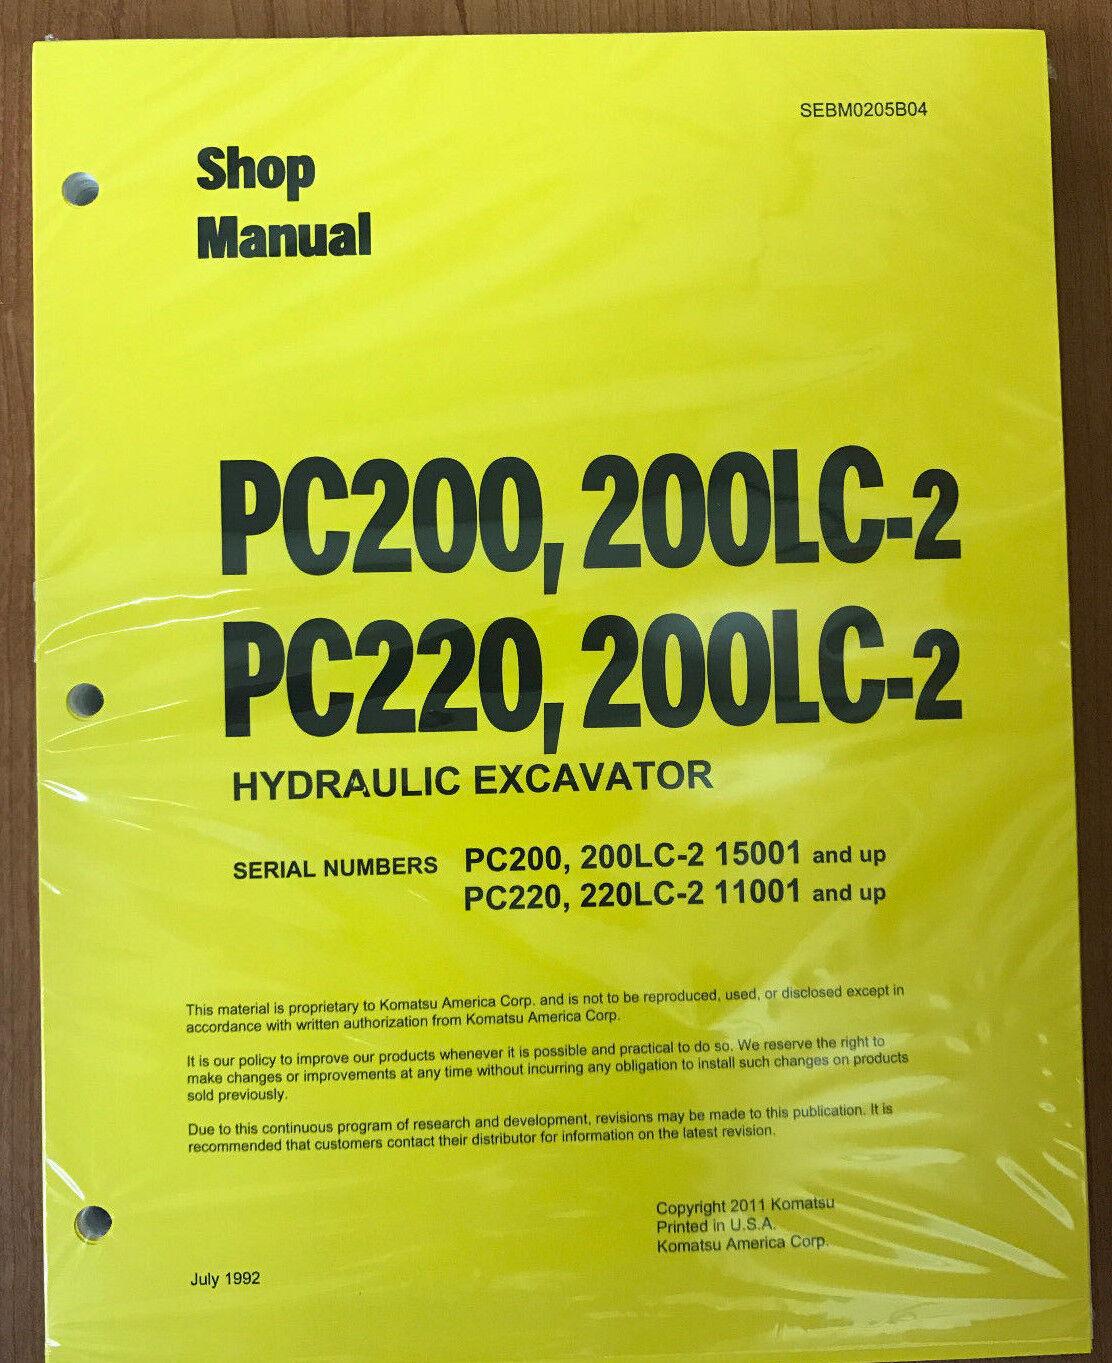 Komatsu Pc200 220 2 Pc220 220lc Excavator Shop Manual Ebay Excavators Wiring Diagram